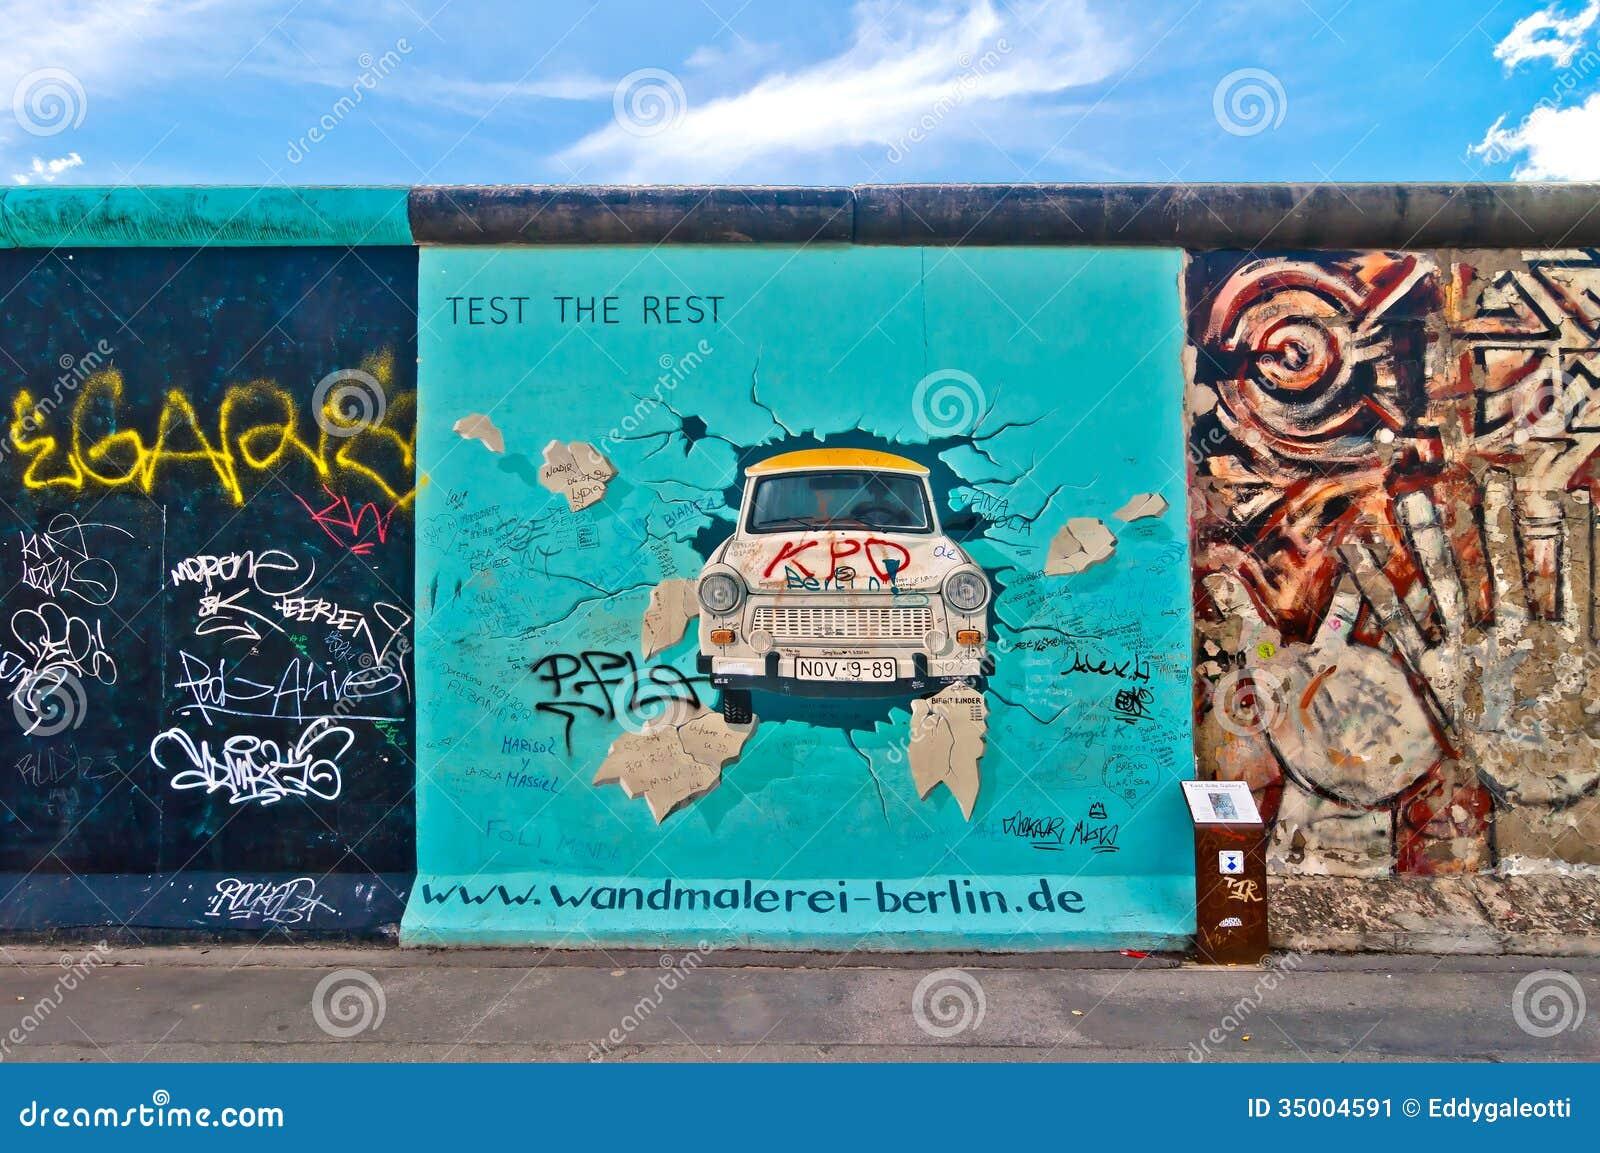 Peinture de Trabant de Birgit Kinder sur Berlin Wall dans la galerie de côté est, Berlin